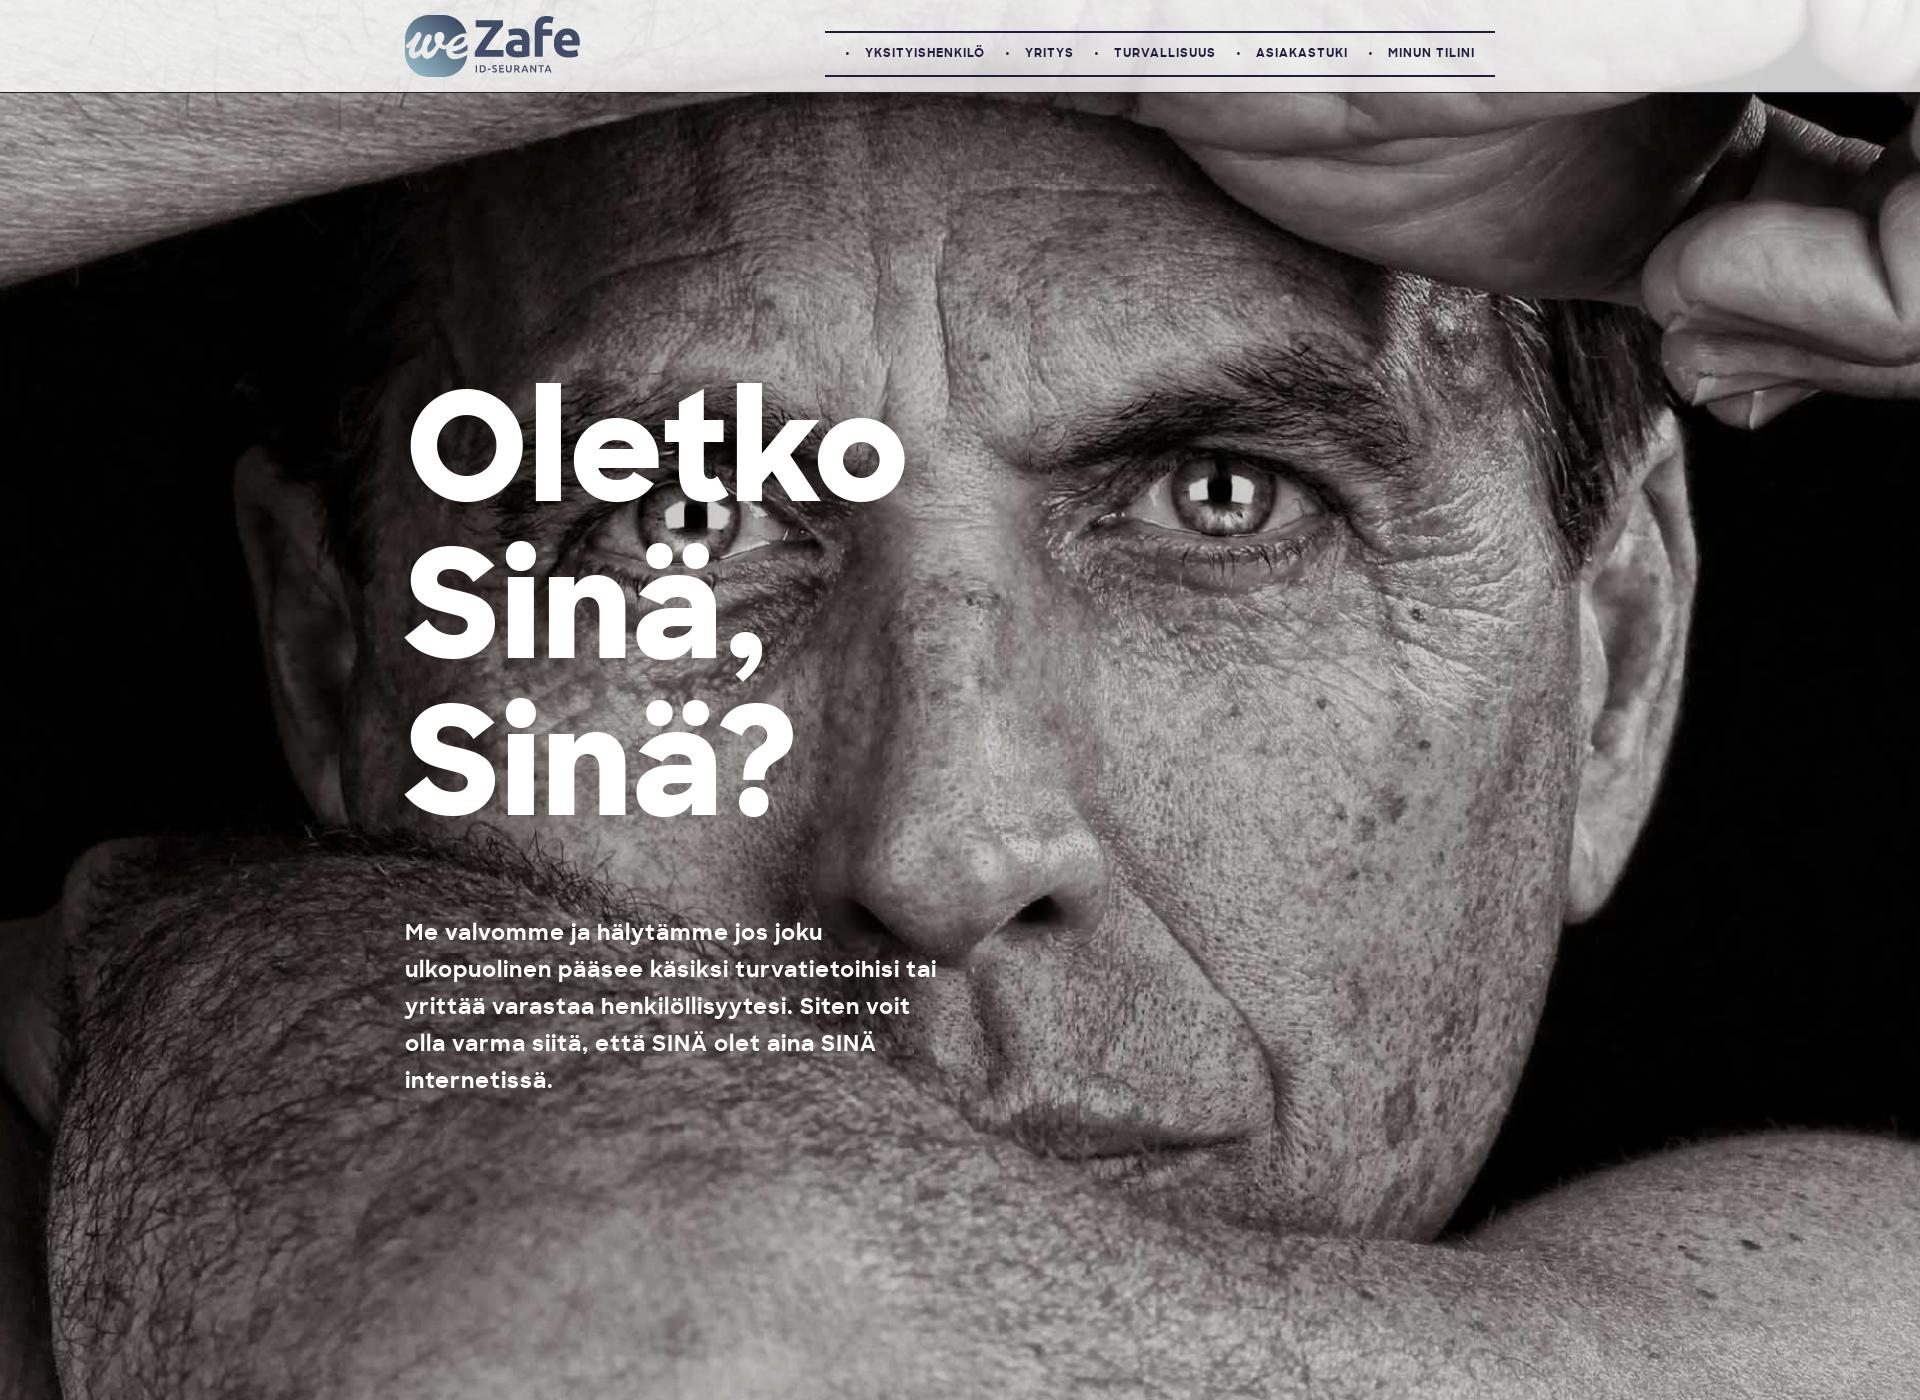 Screenshot for wezafe.fi